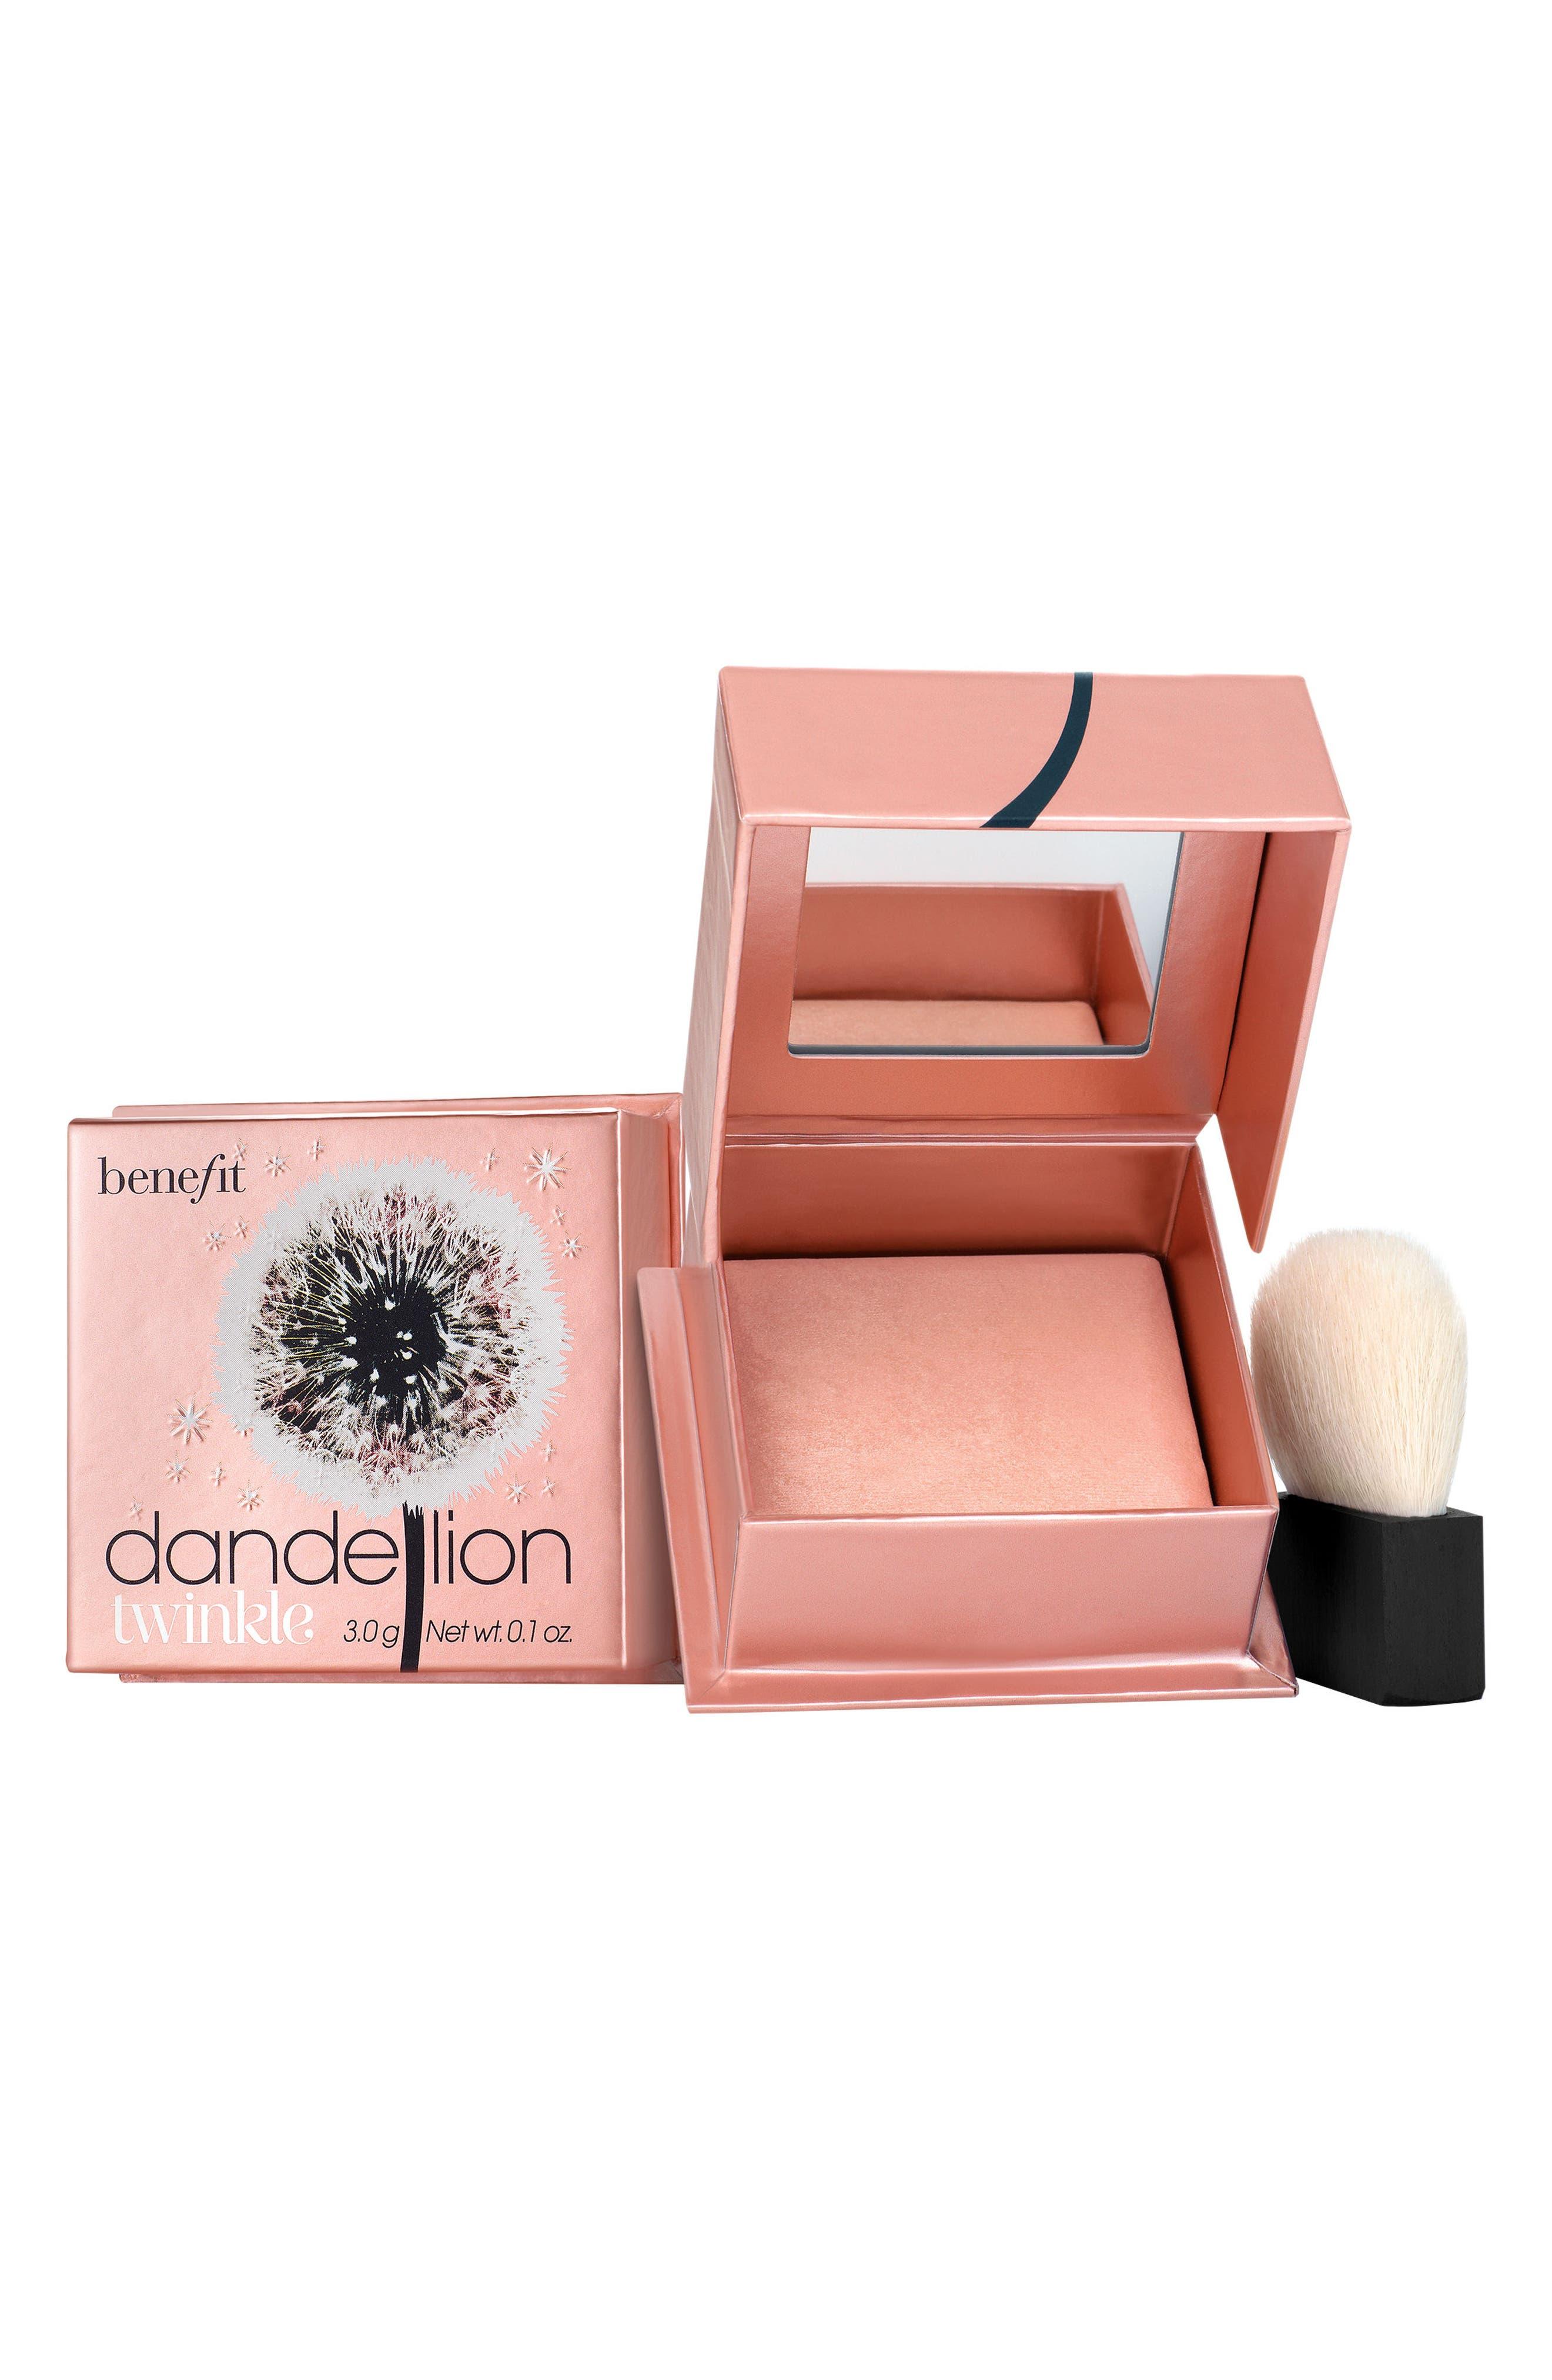 Benefit Dandelion Twinkle Powder Highlighter,                         Main,                         color, Nude Pink